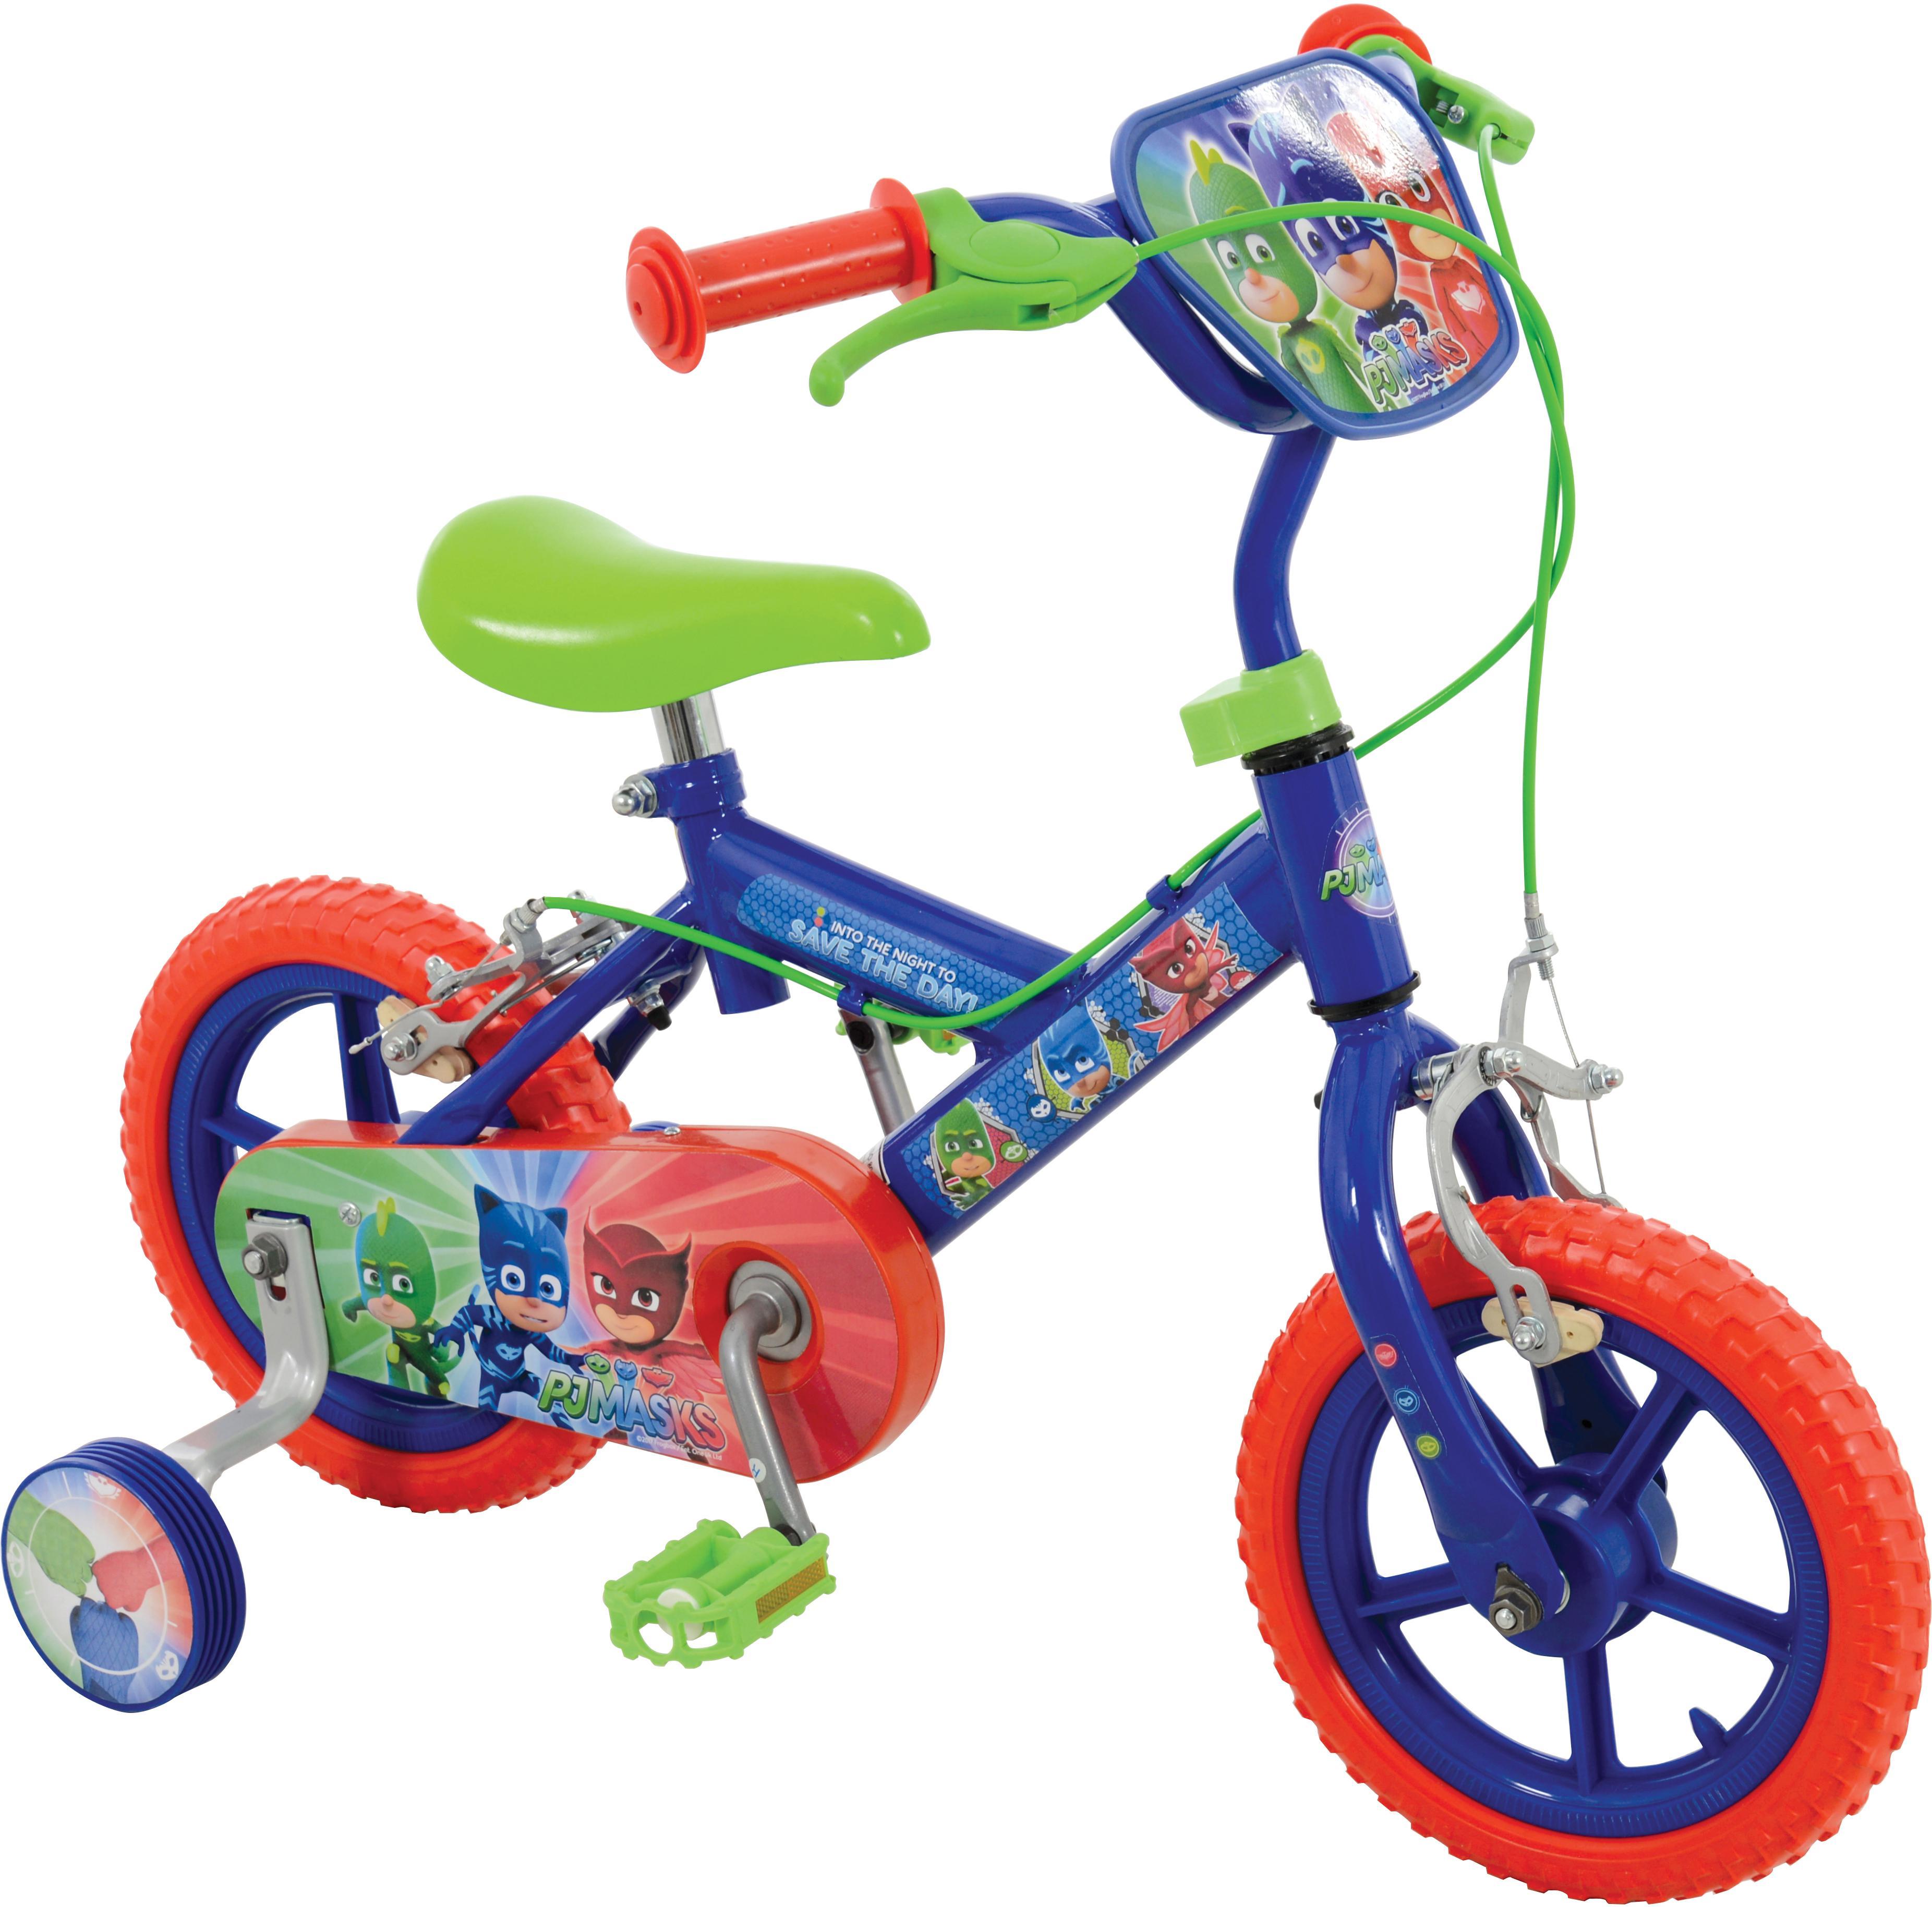 PJ Masks Kids Bike - 12 inch Wheel